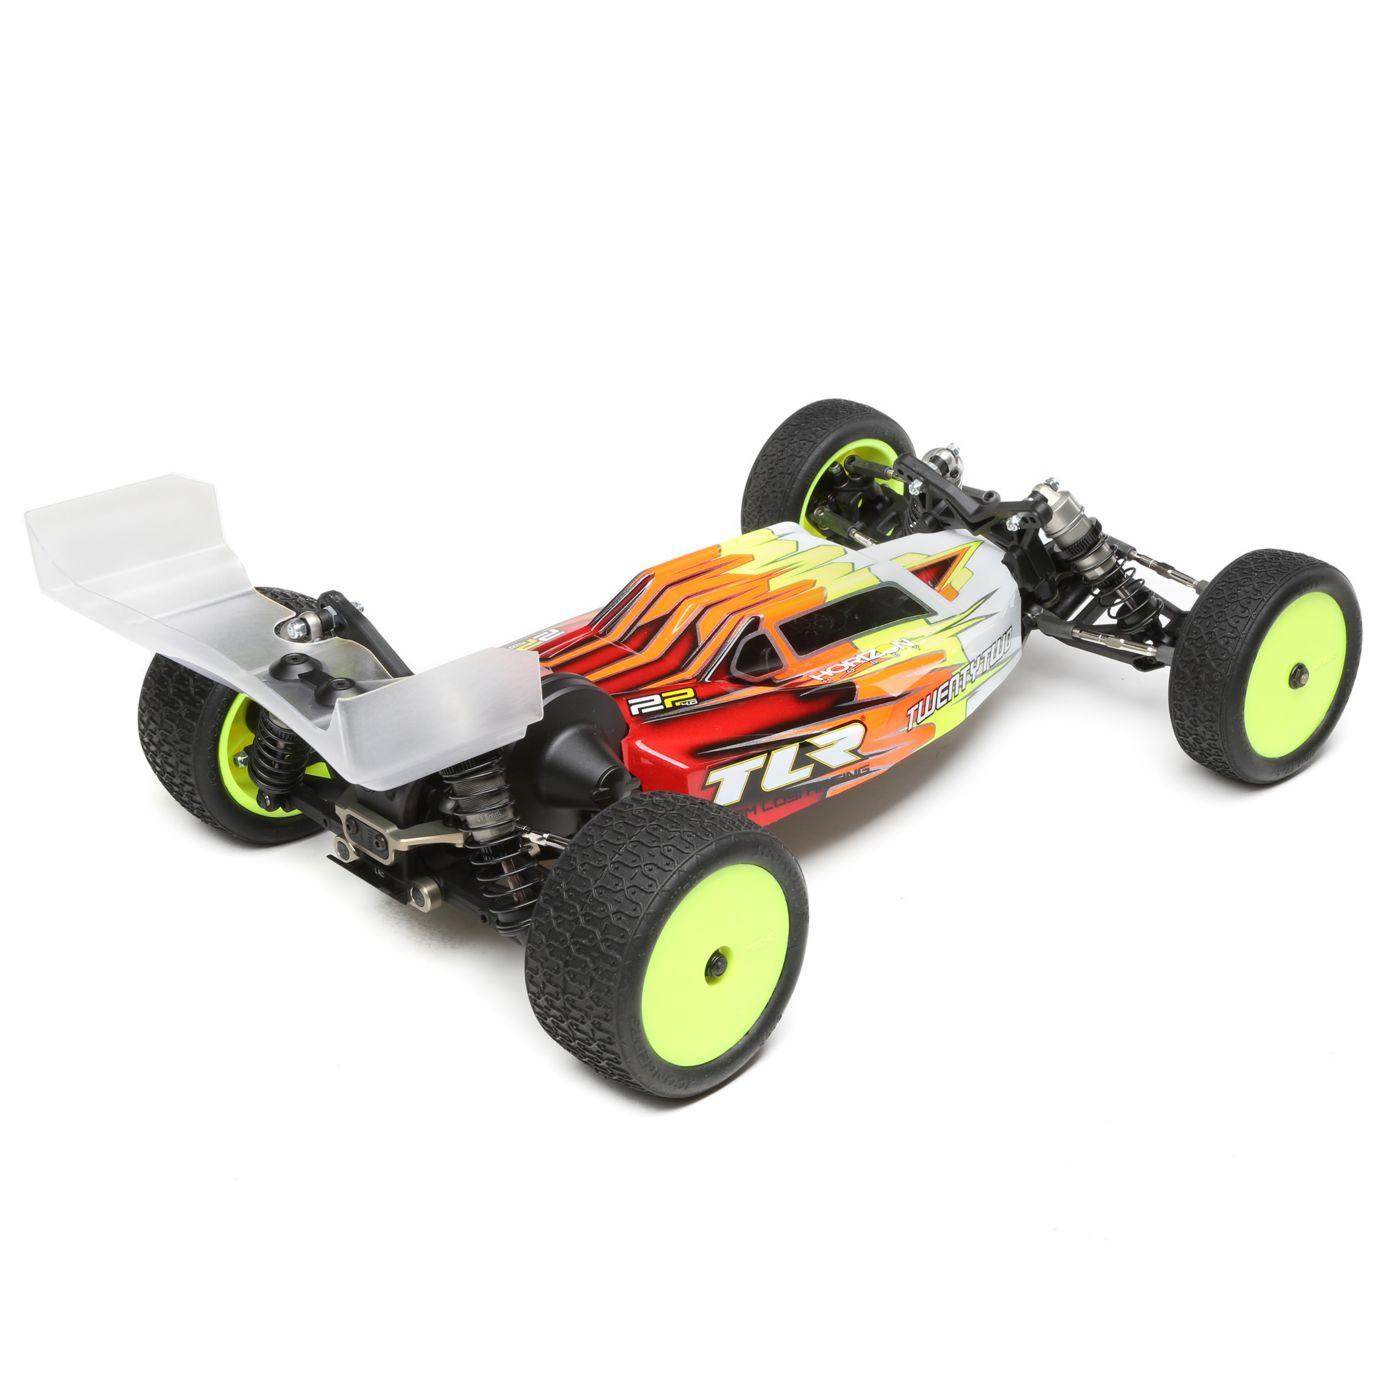 Team Losi Racing 22 4.0 - Rear